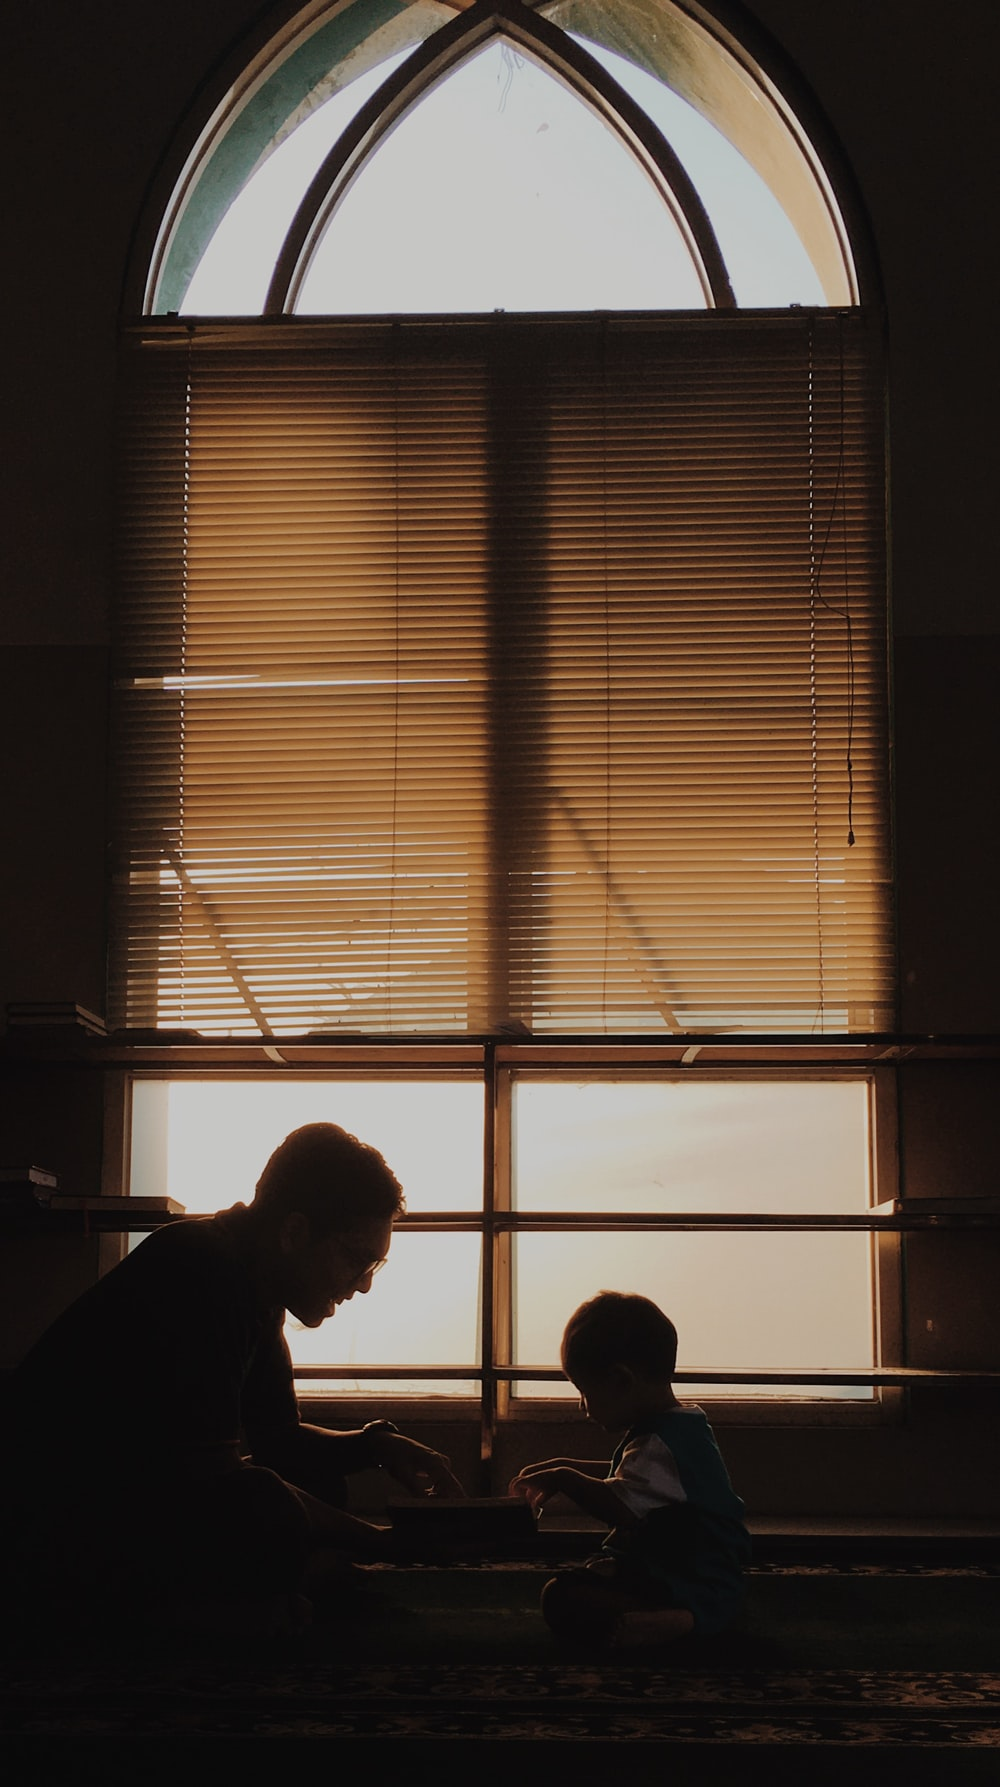 man in black shirt standing near window